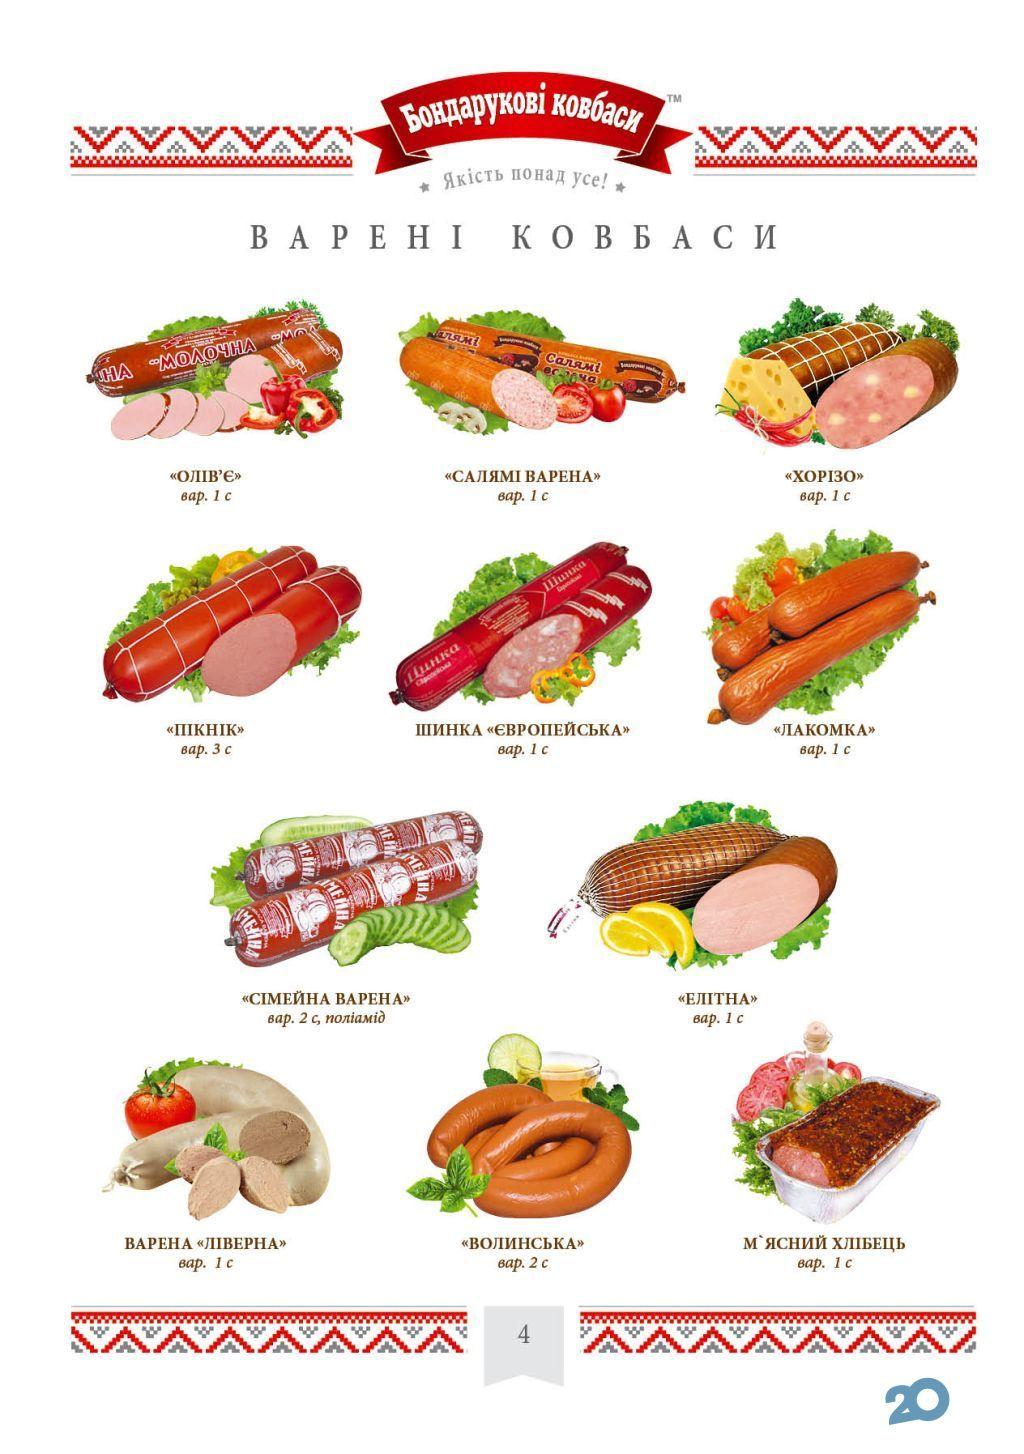 Бондарукові ковбаси, м'ясний магазин - фото 11